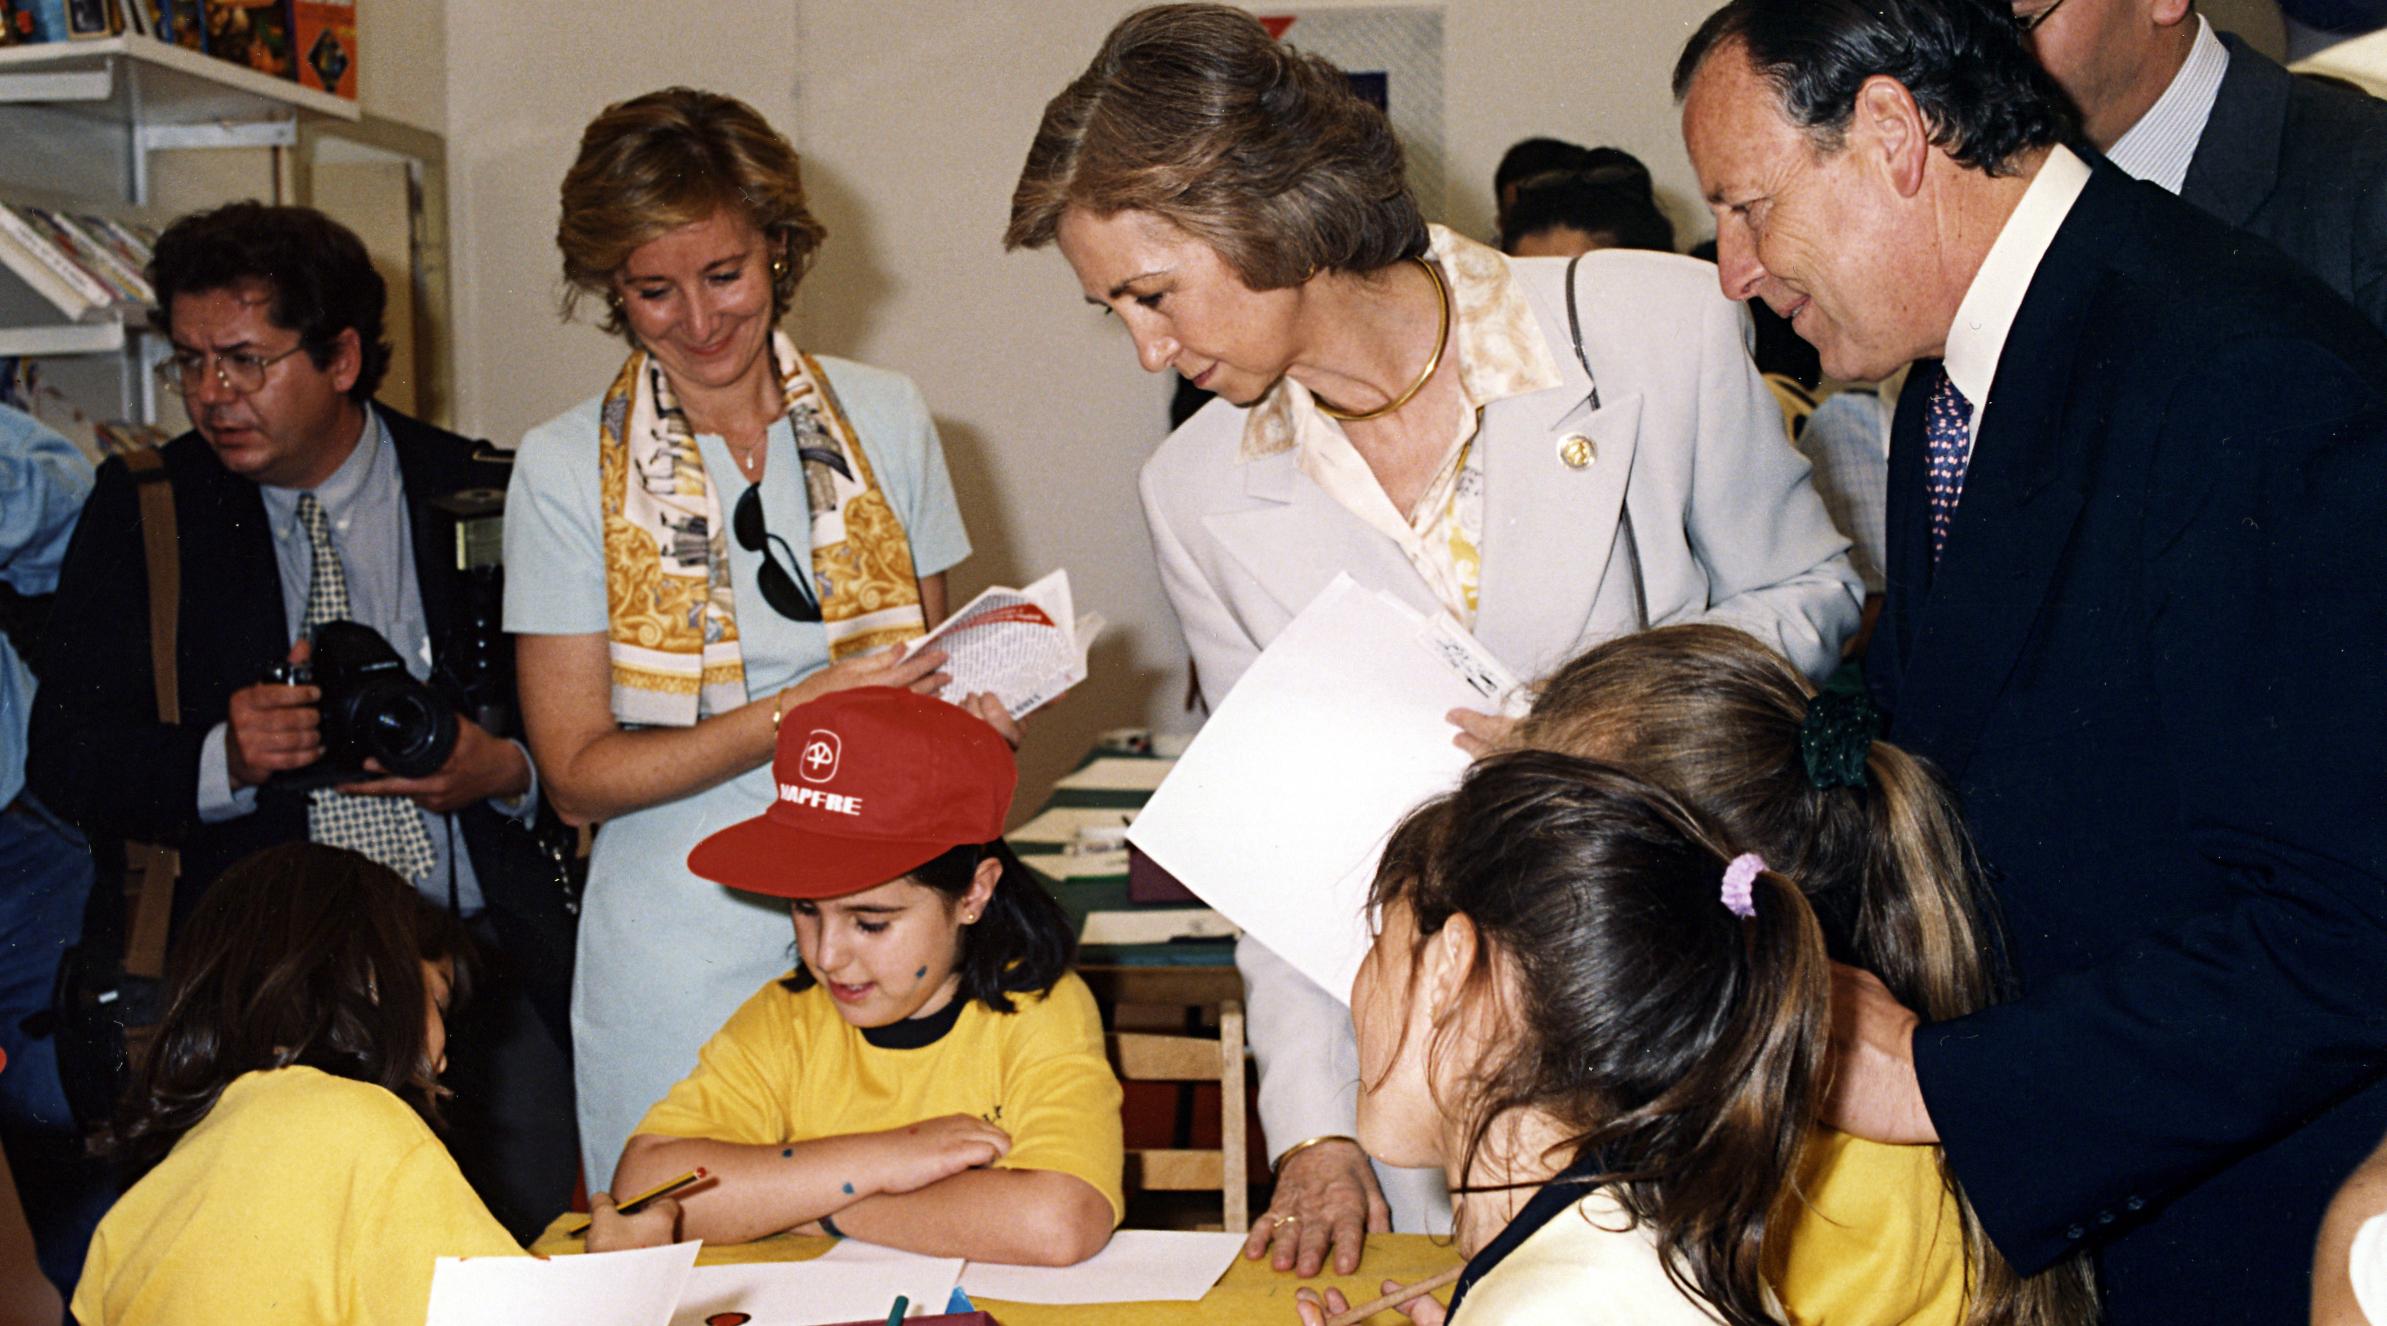 Visita de la reina al taller organizado por MAPFRE